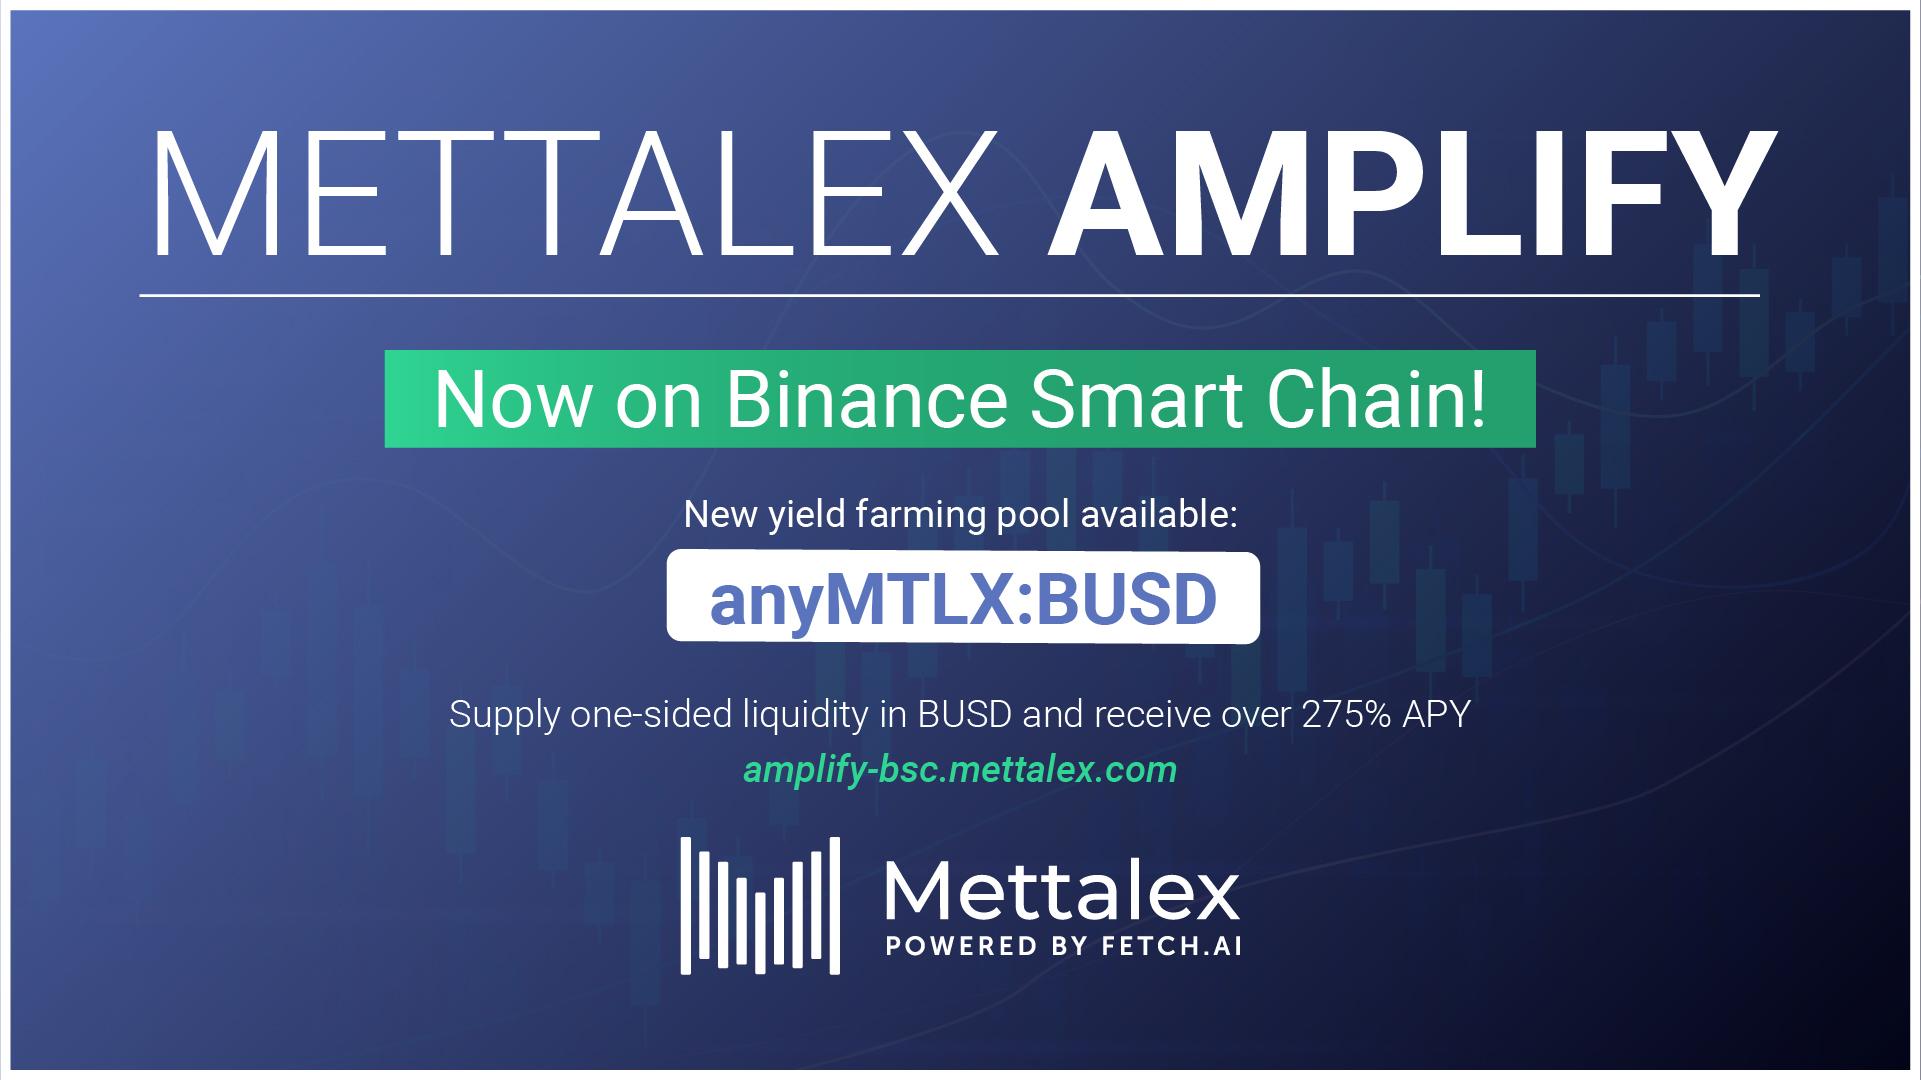 https://mettalex.com/wp-content/uploads/Mettalex-Amplify_4.jpg